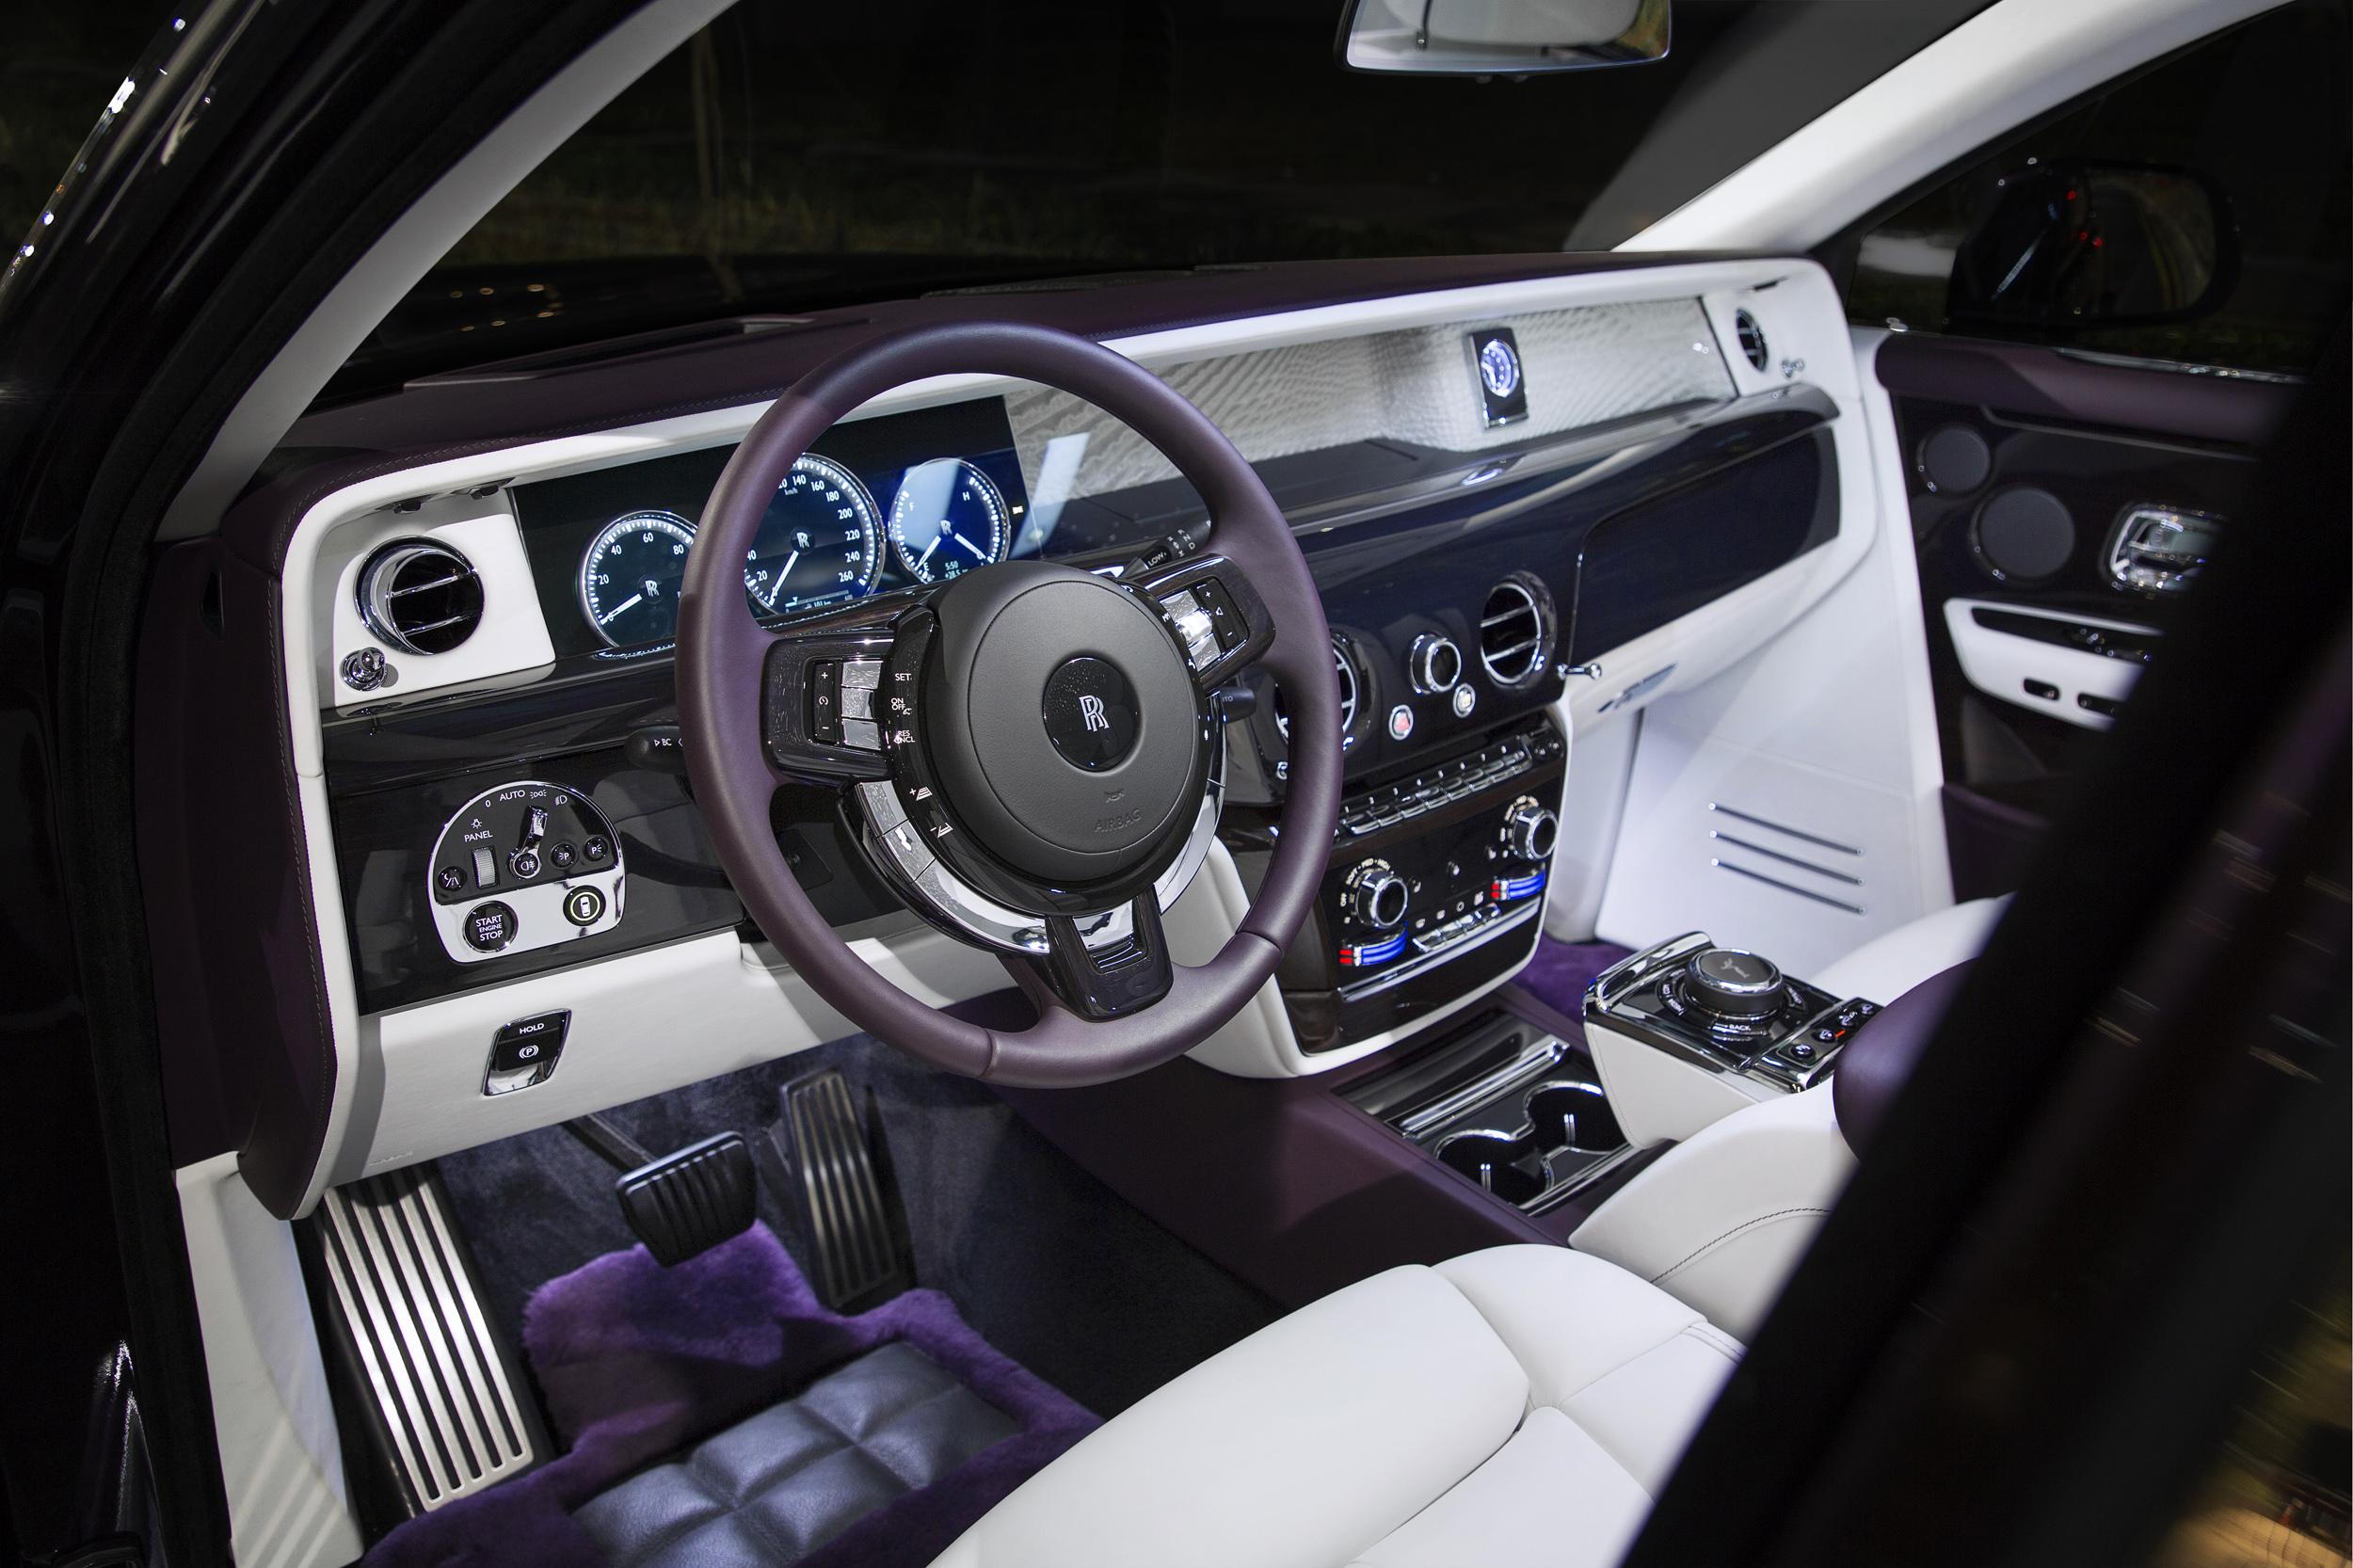 Rolls-Royce Phantom console and steering wheel